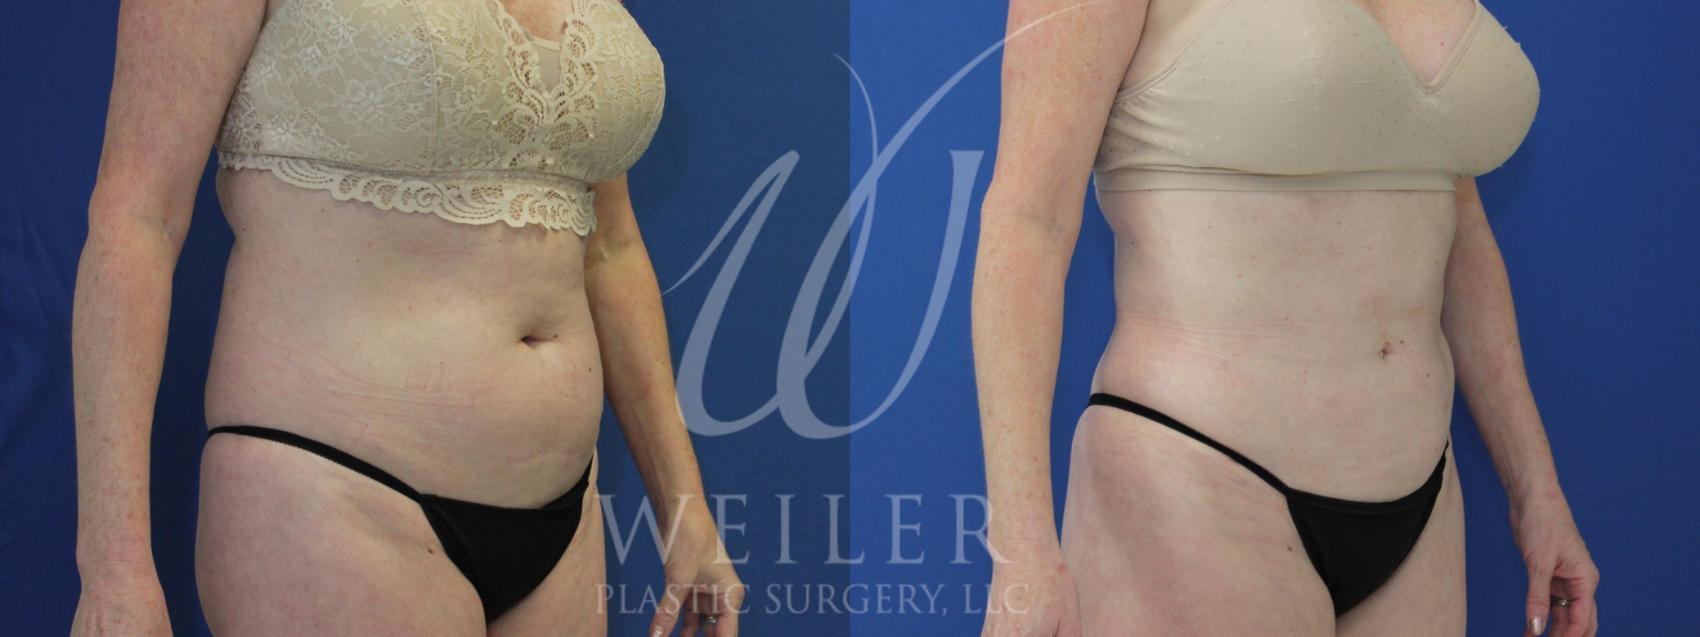 Liposuction Baton Rouge | Laser Lipo Hammond | Liposuction